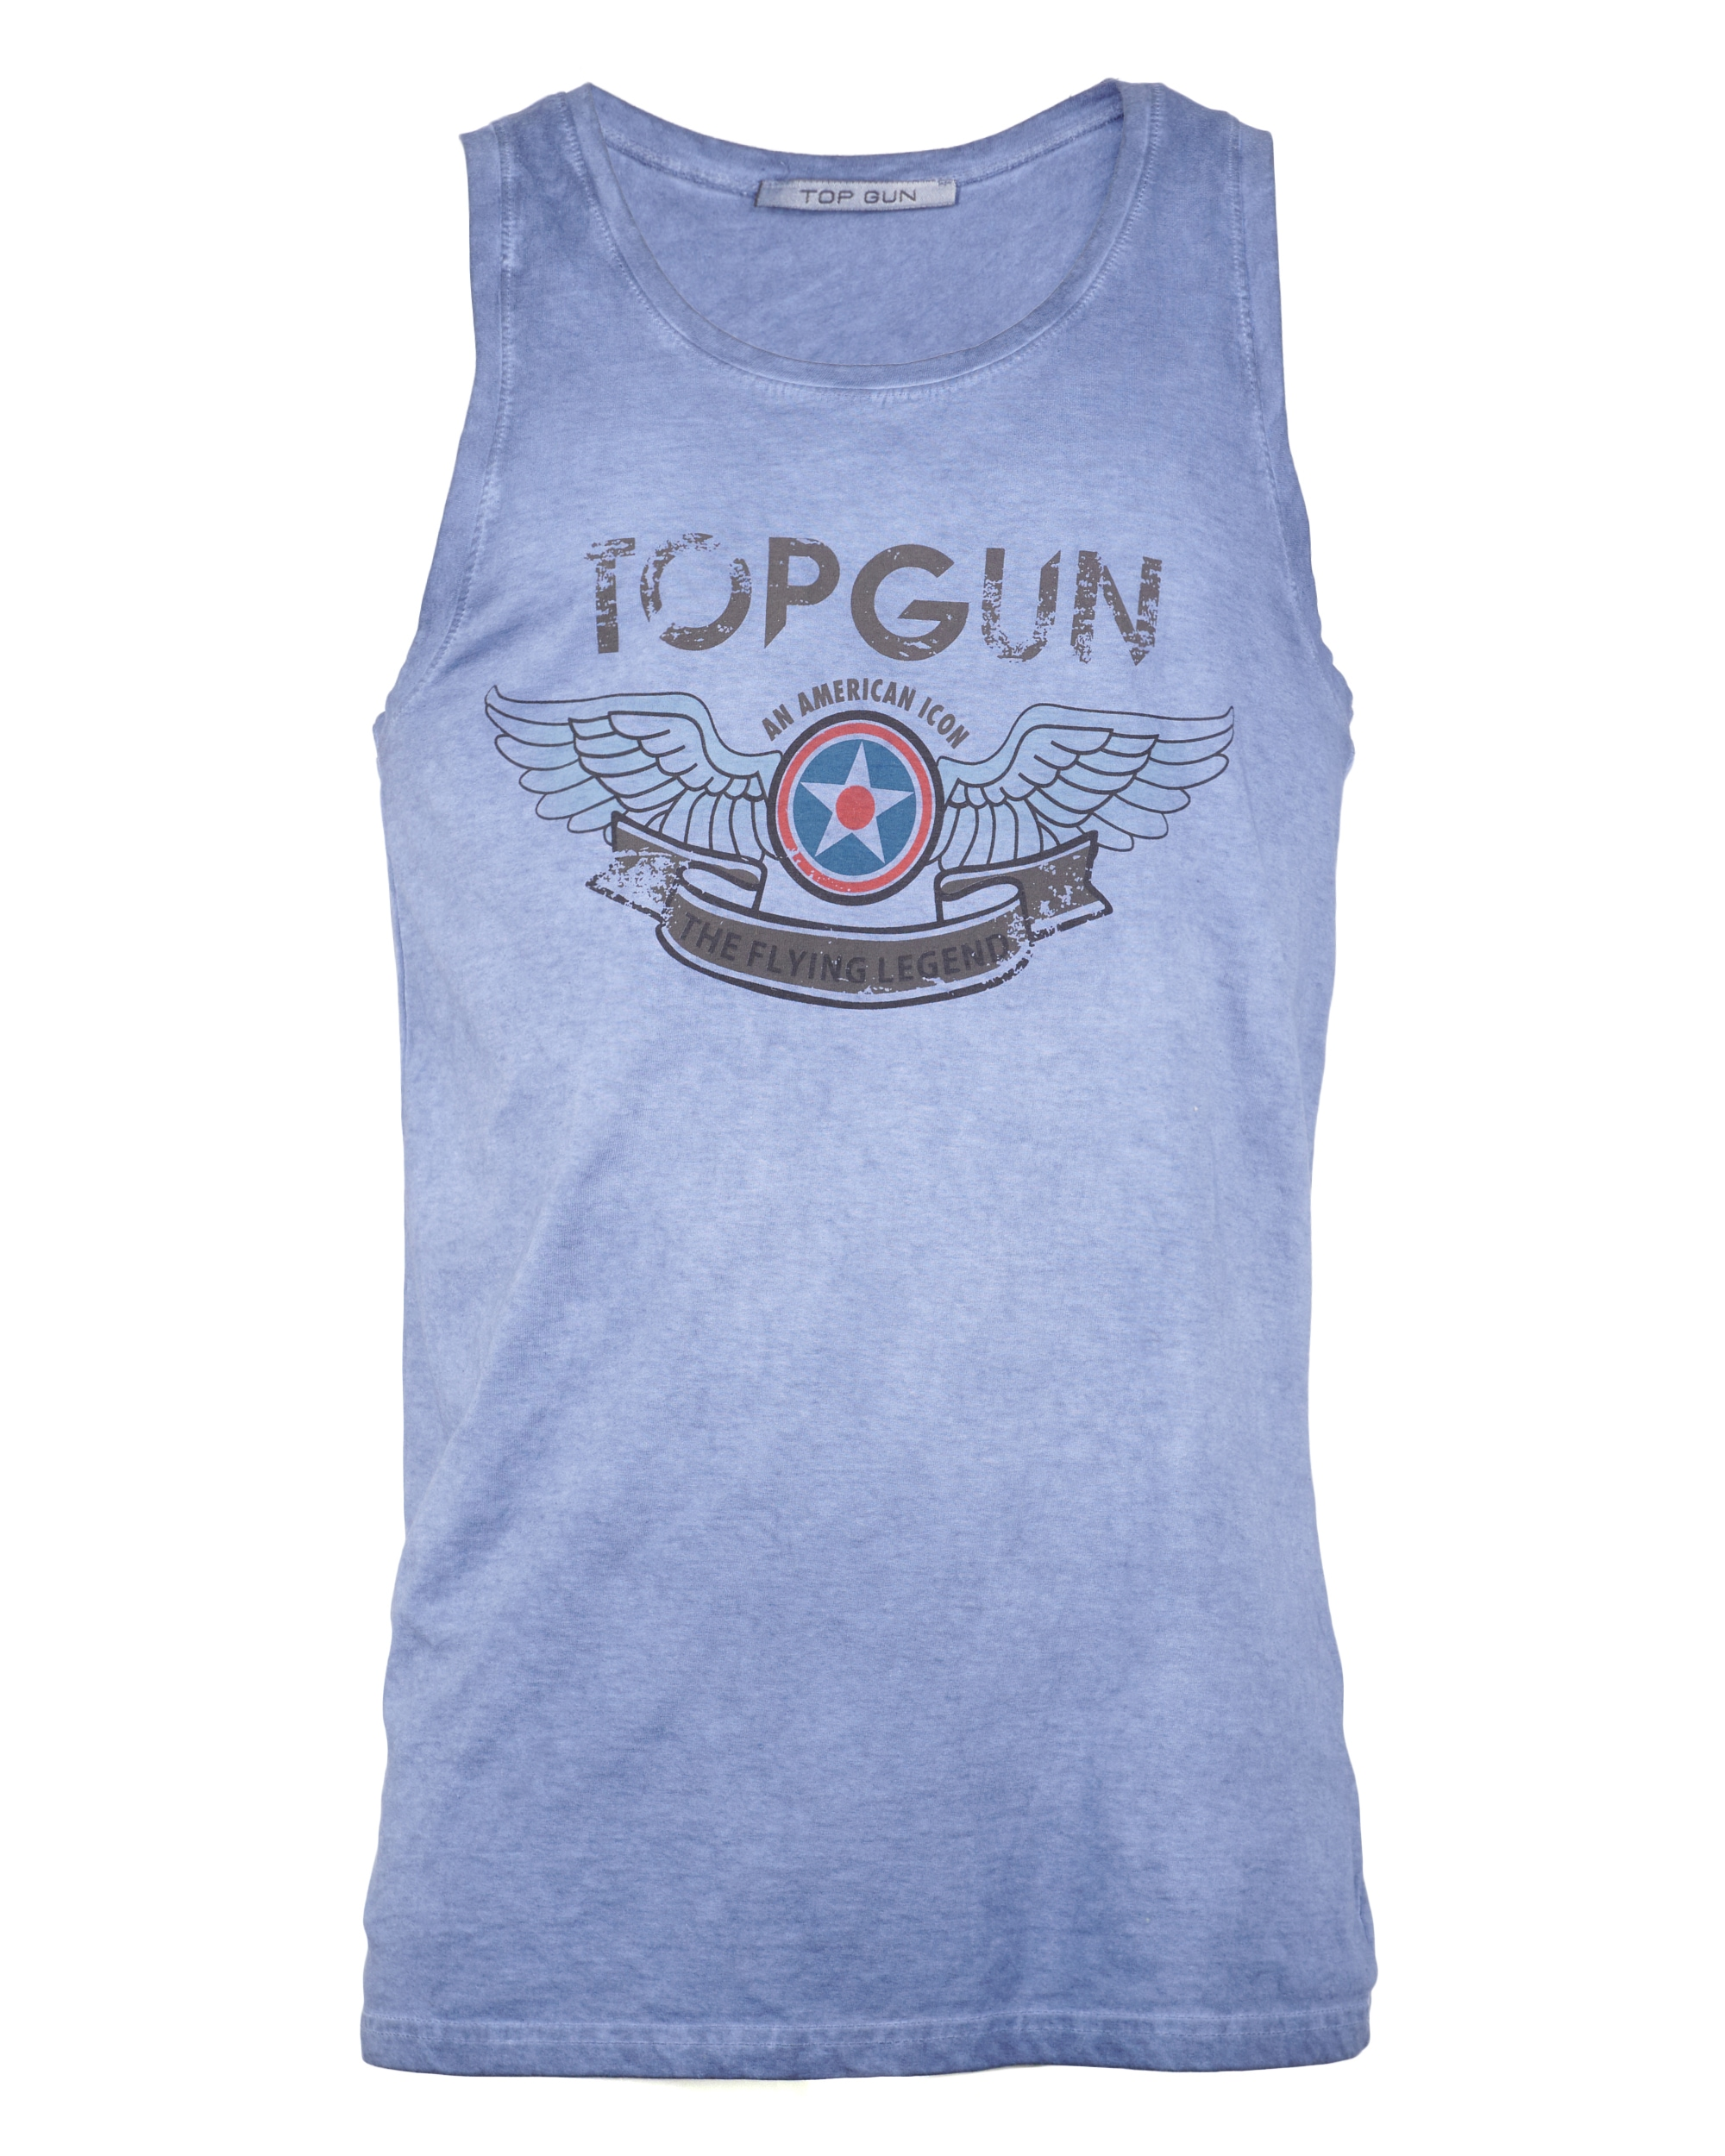 TOP GUN Muscleshirt Flap blau Herren Tank Tops Shirts